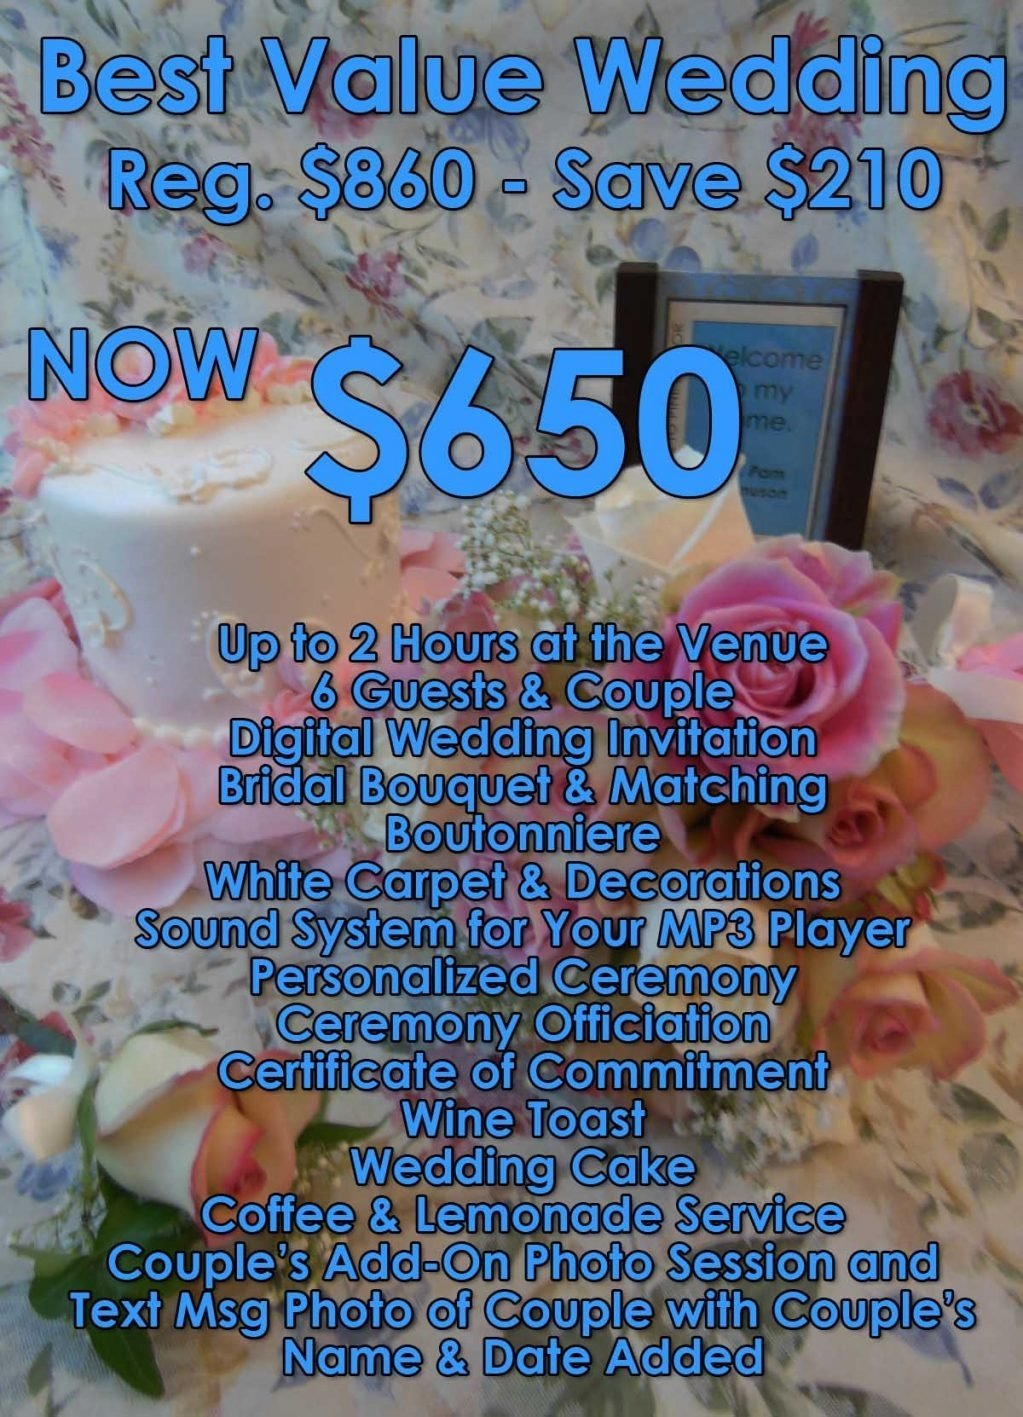 10 Cute Small Wedding Ideas On A Budget wedding wedding small ideas columbus ohio buffet on budget for 2020